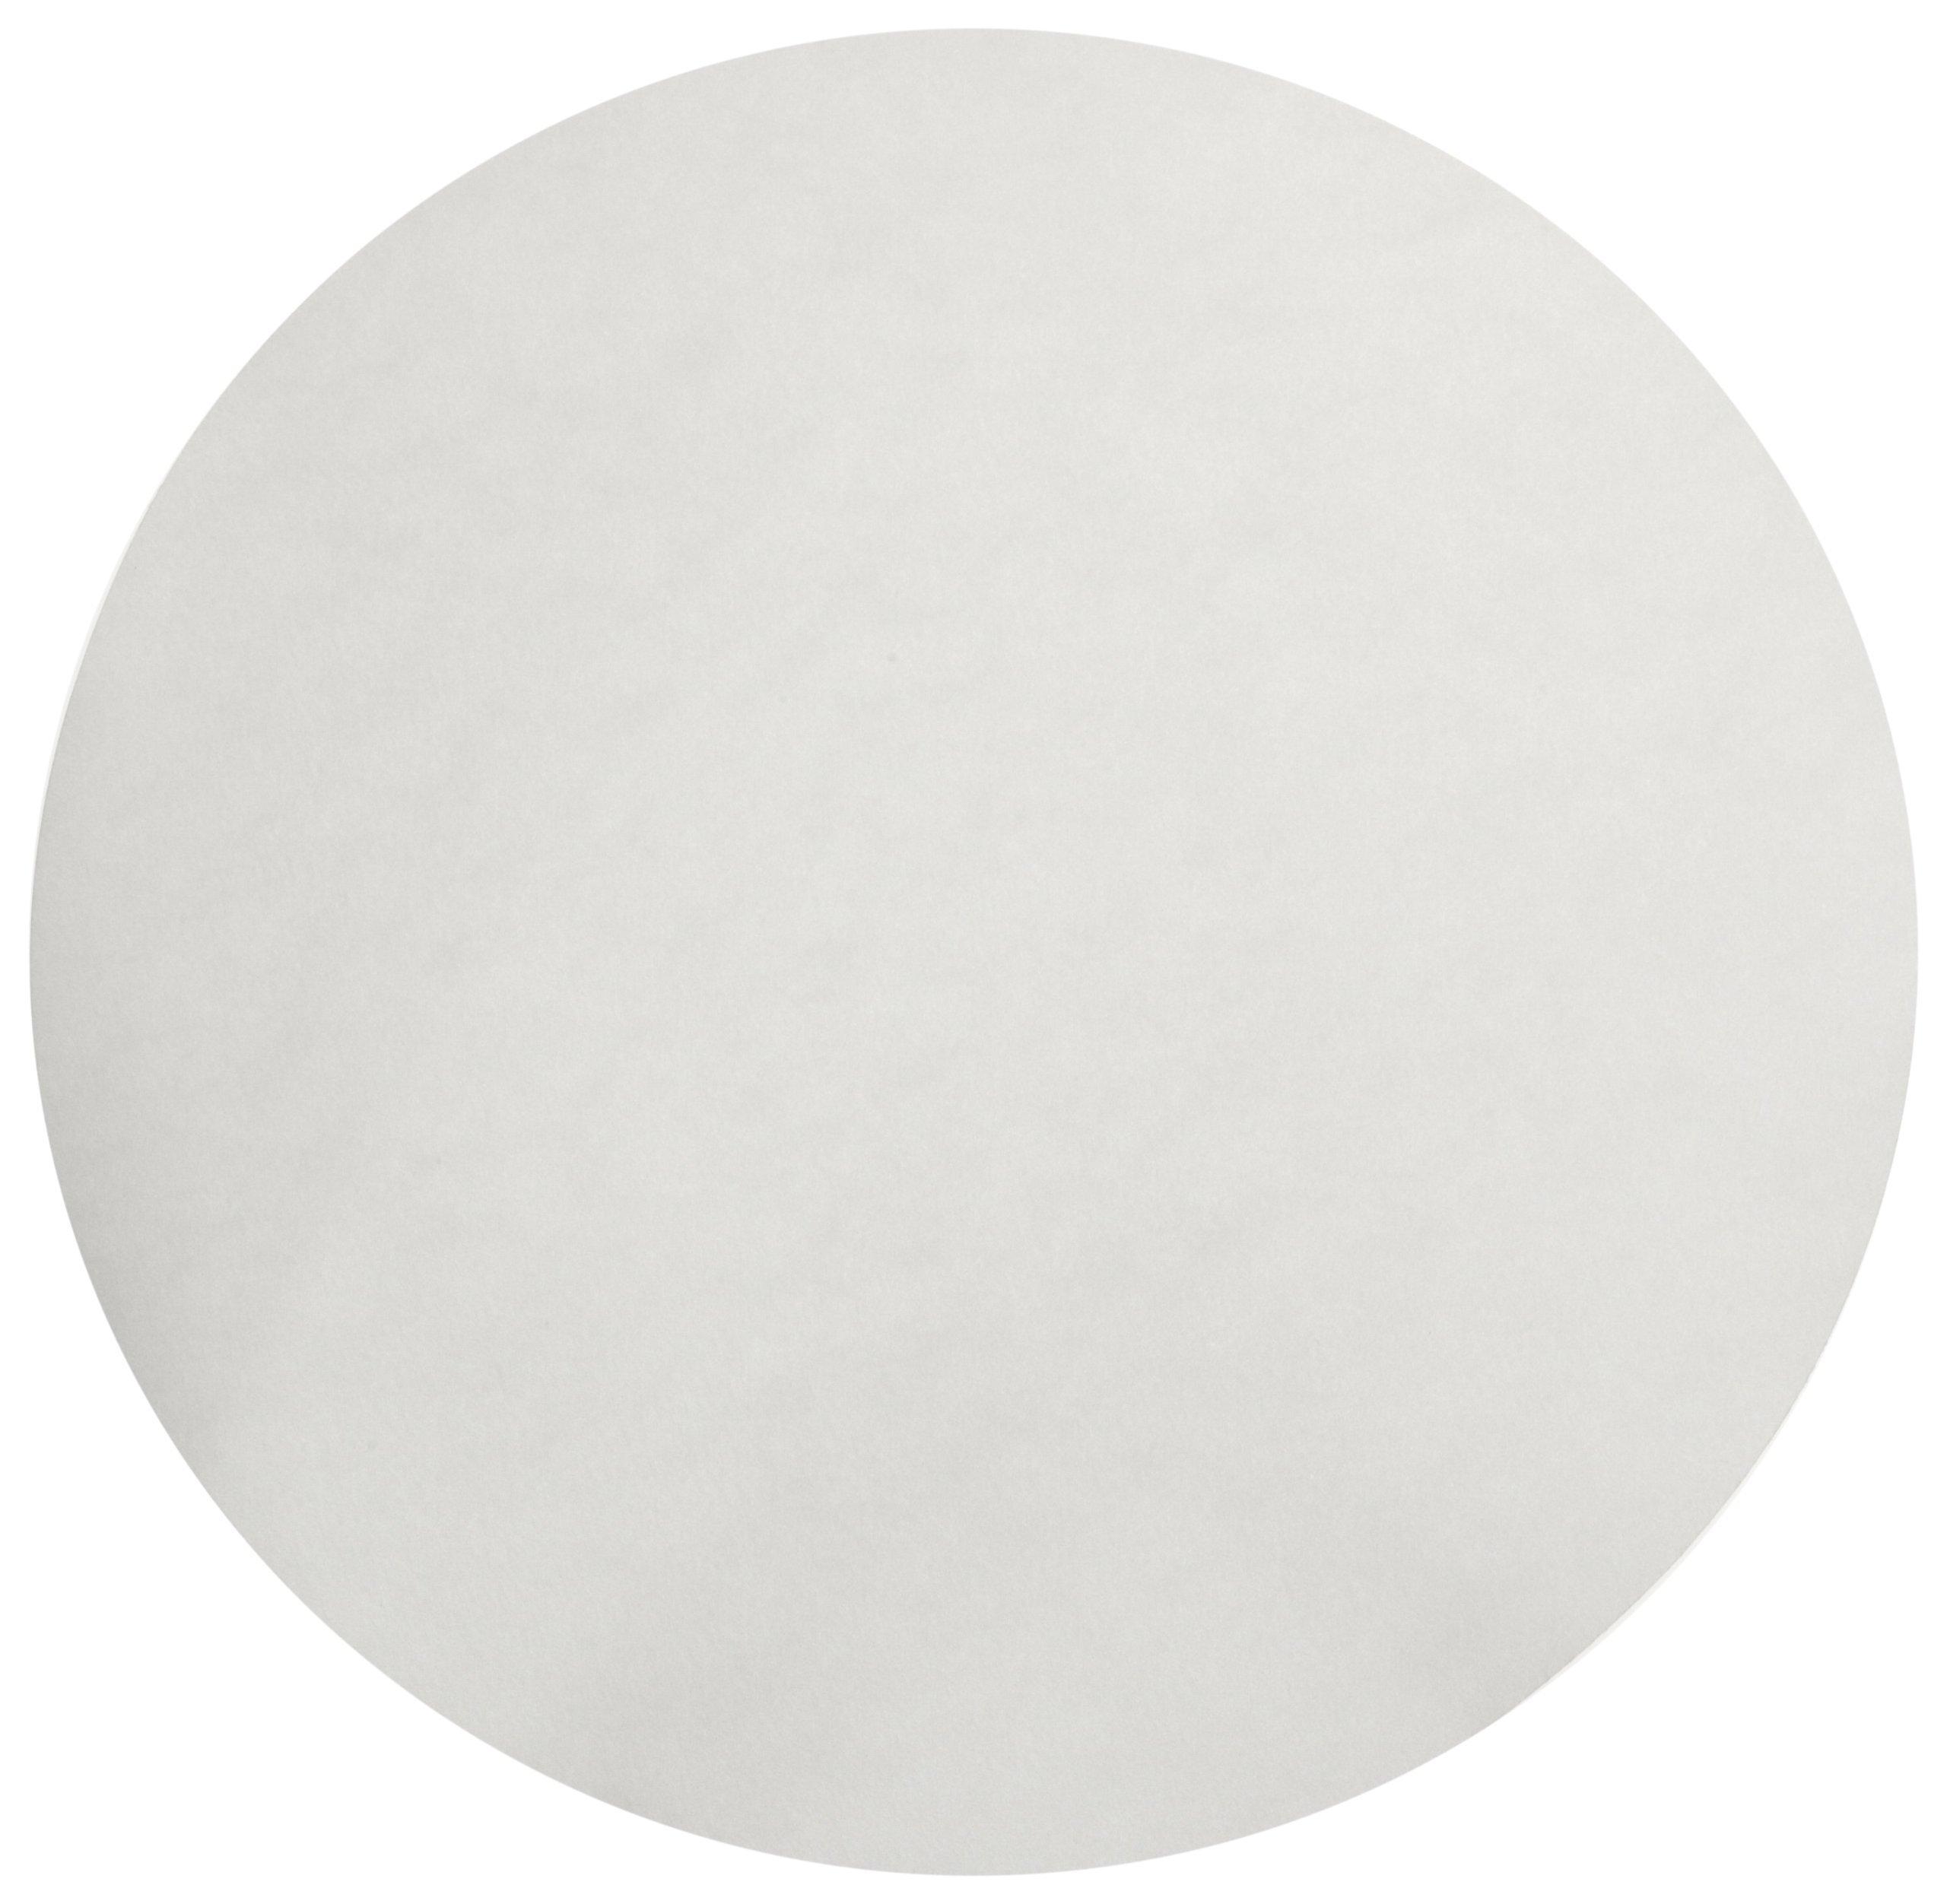 Whatman 1454-240 Hardened Low Ash Quantitative Filter Paper, 24.0cm Diameter, 22 Micron, Grade 54 (Pack of 100)